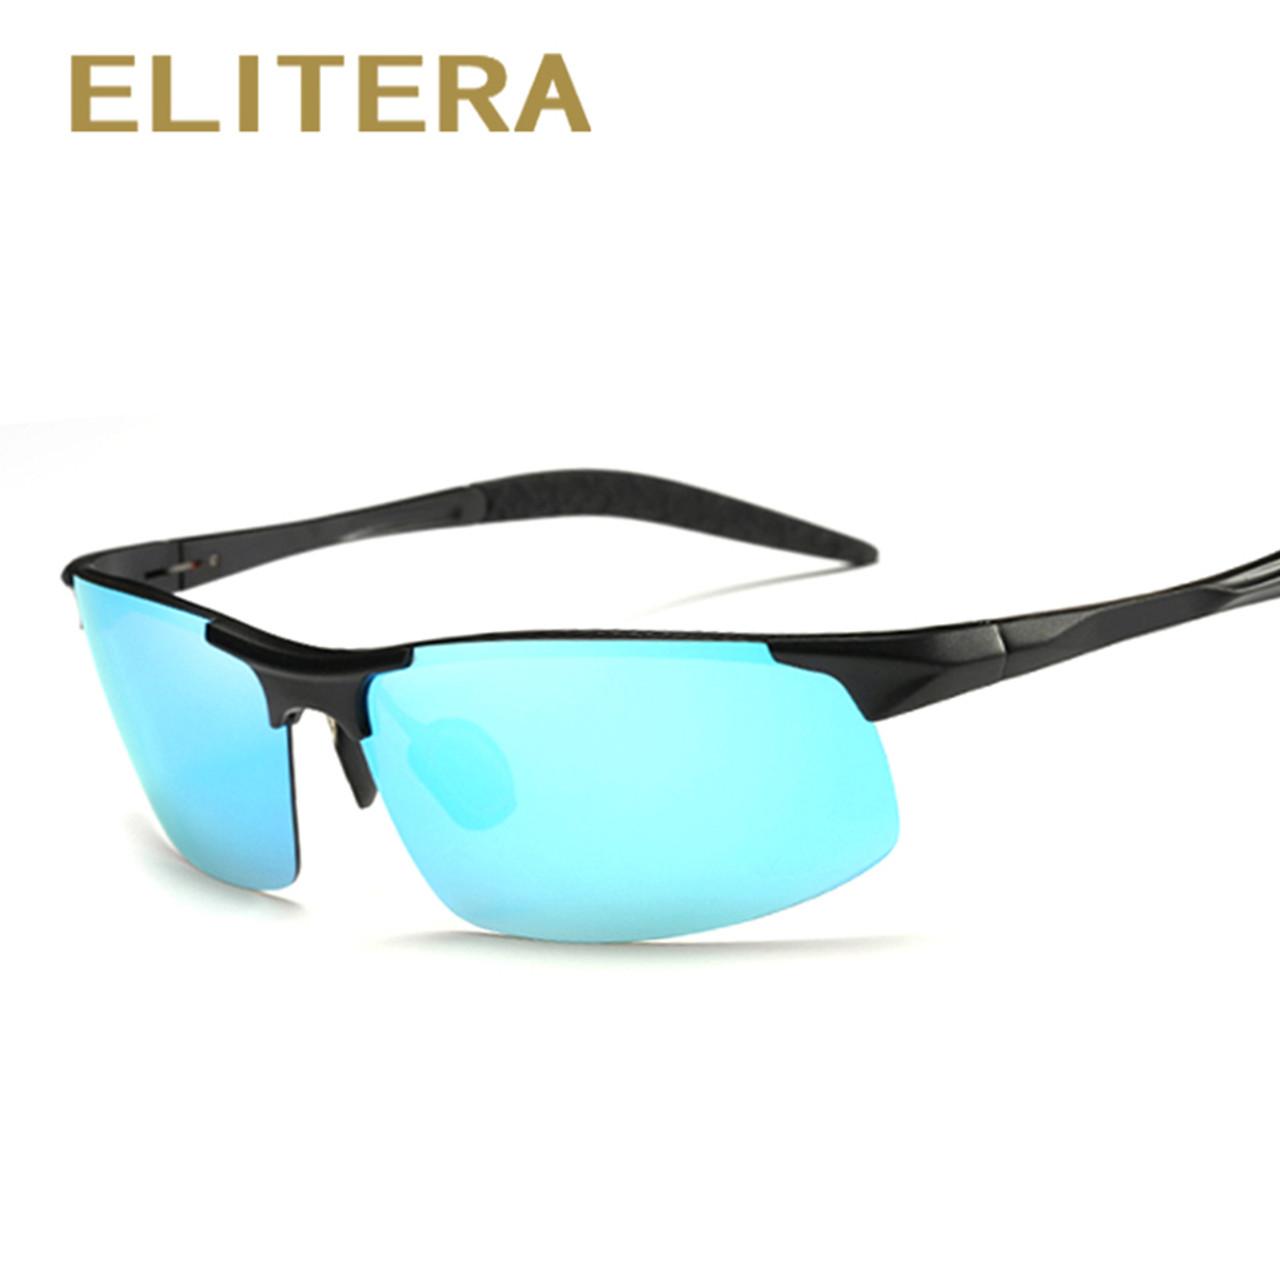 df4c6010f92 ... ELITERA Aluminum Brand New Polarized Sunglasses Men Fashion Sun Glasses  Travel Driving Male Eyewear Oculos Gafas ...